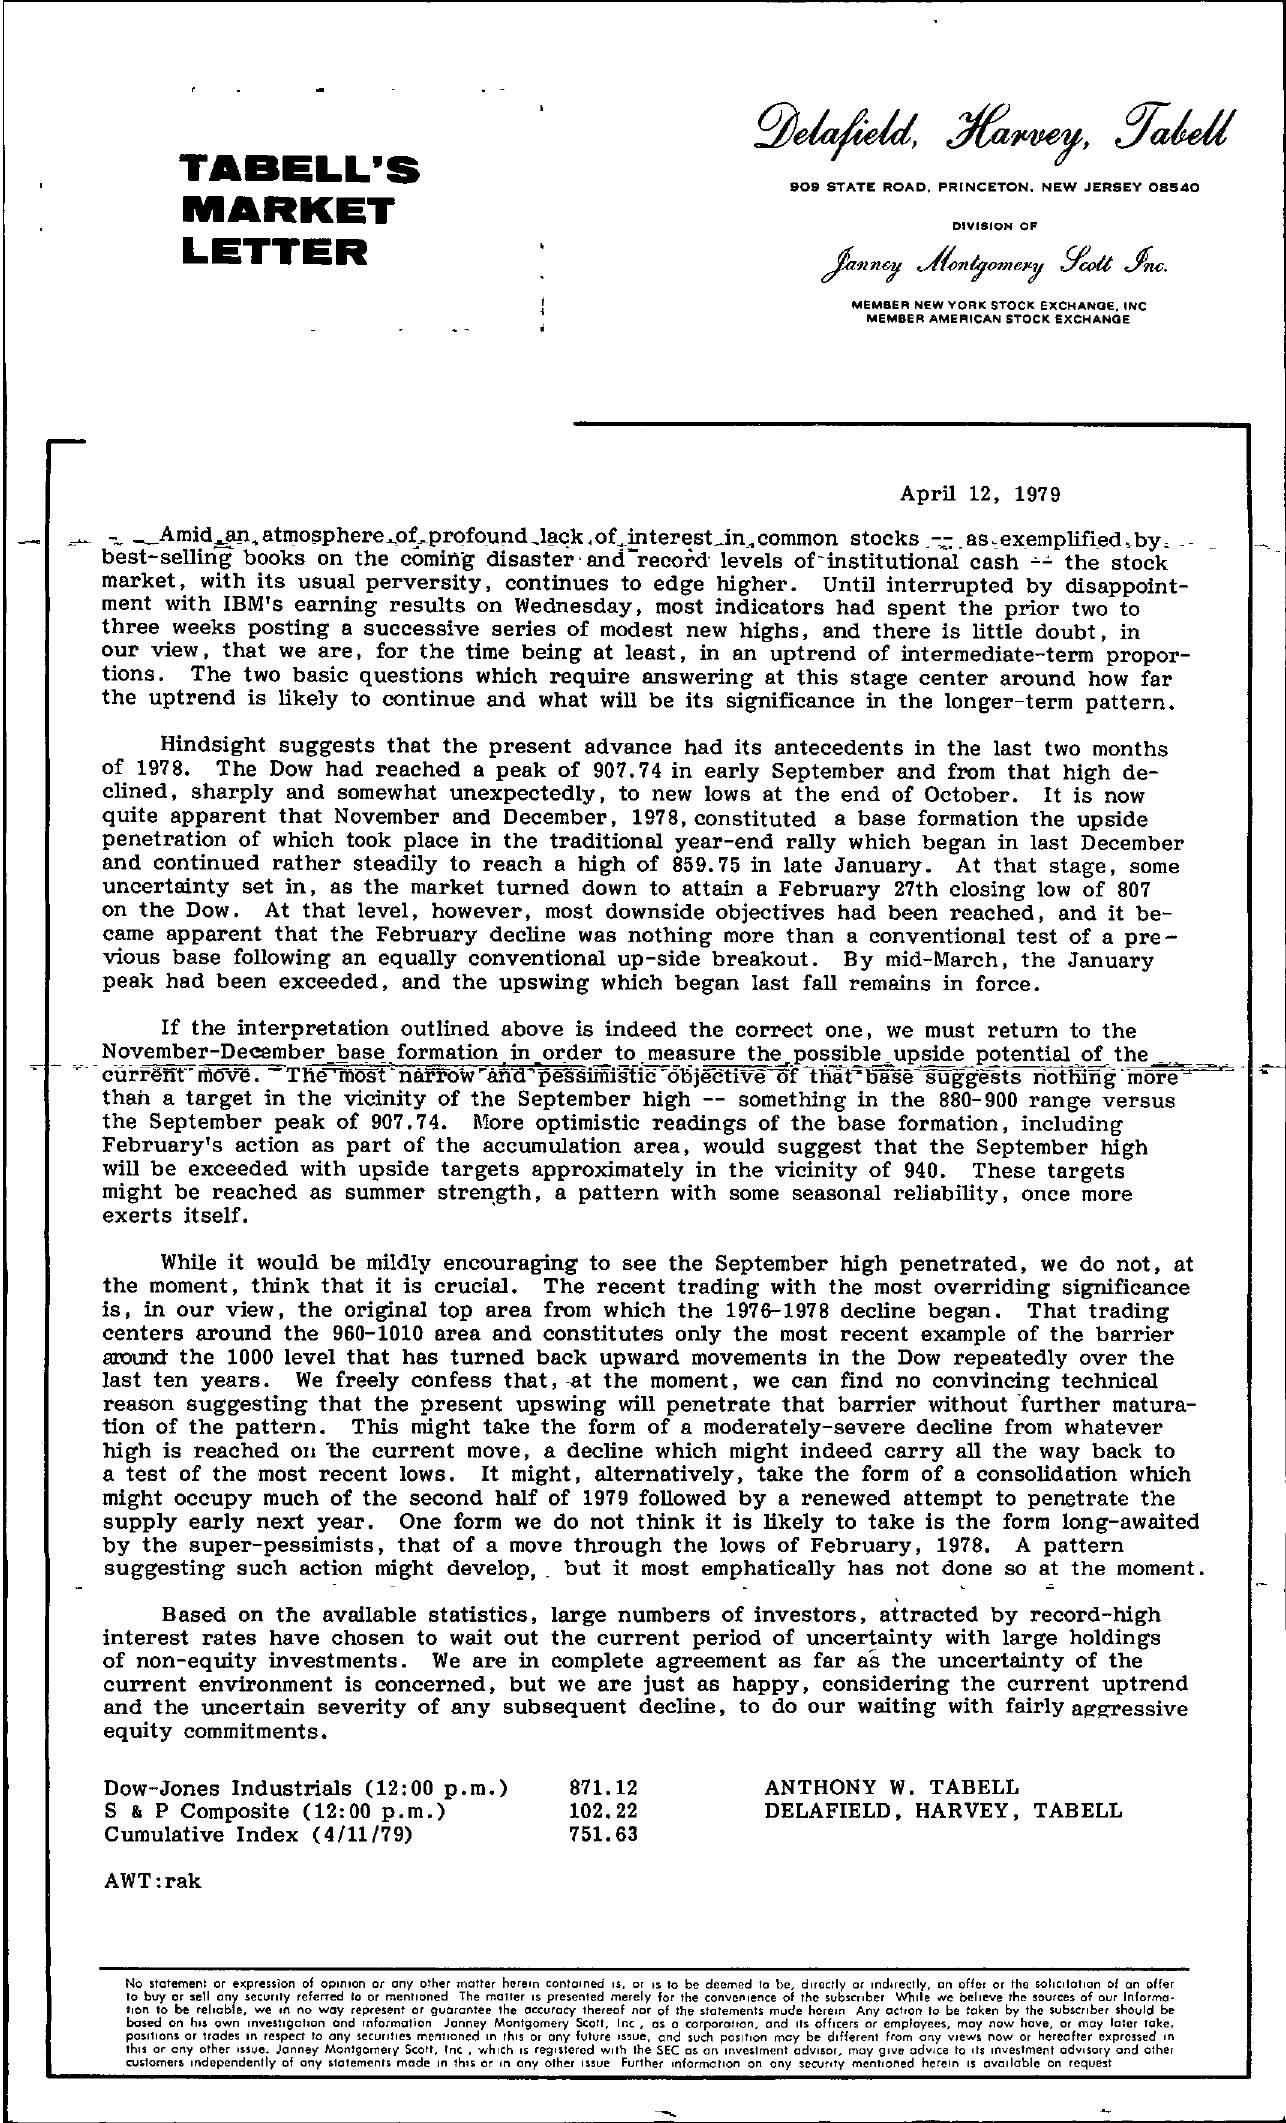 Tabell's Market Letter - April 12, 1979